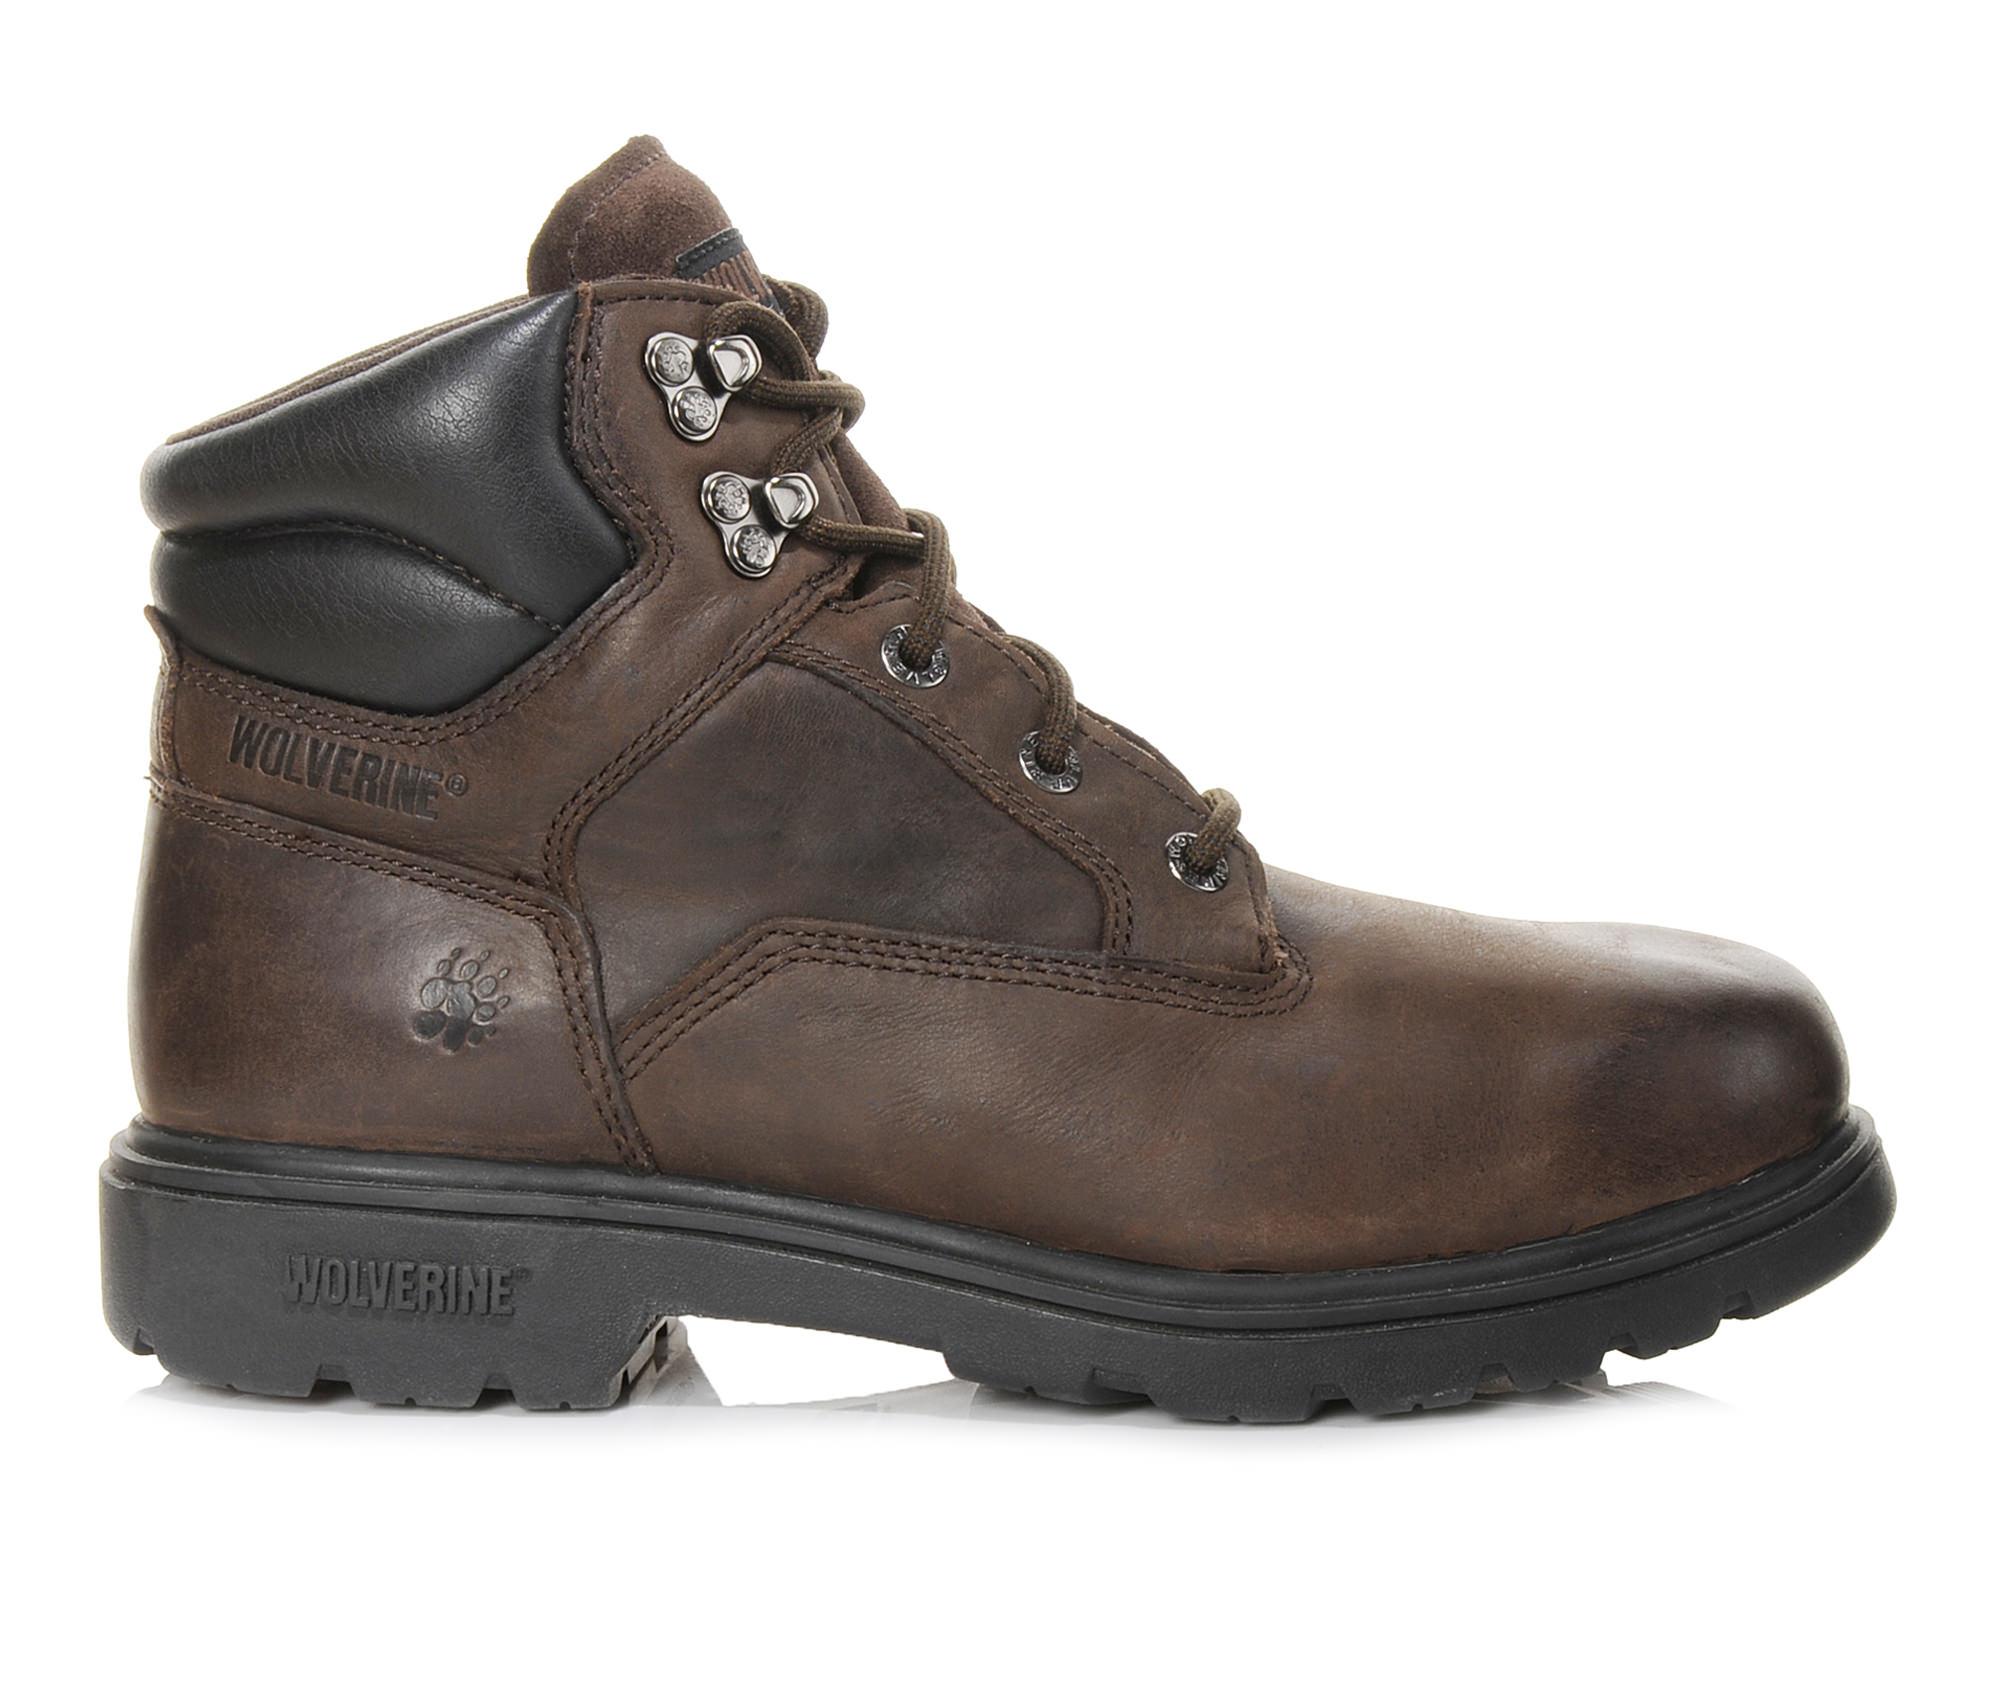 Wolverine Bulldozer Men's Boots (Brown Leather)